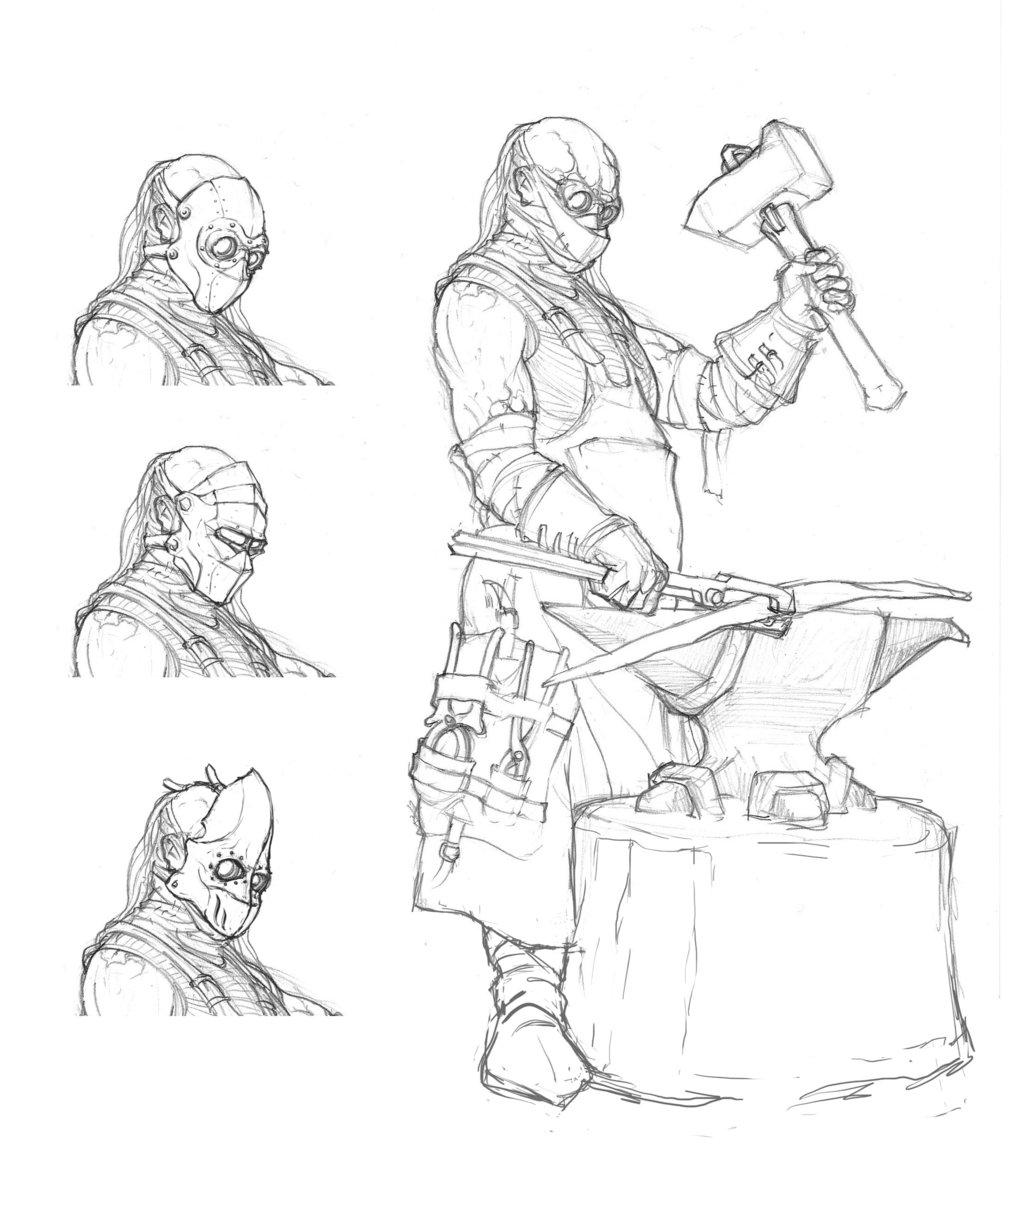 Drawn dwarf blacksmith By blacksmith blacksmith on 2blind2draw